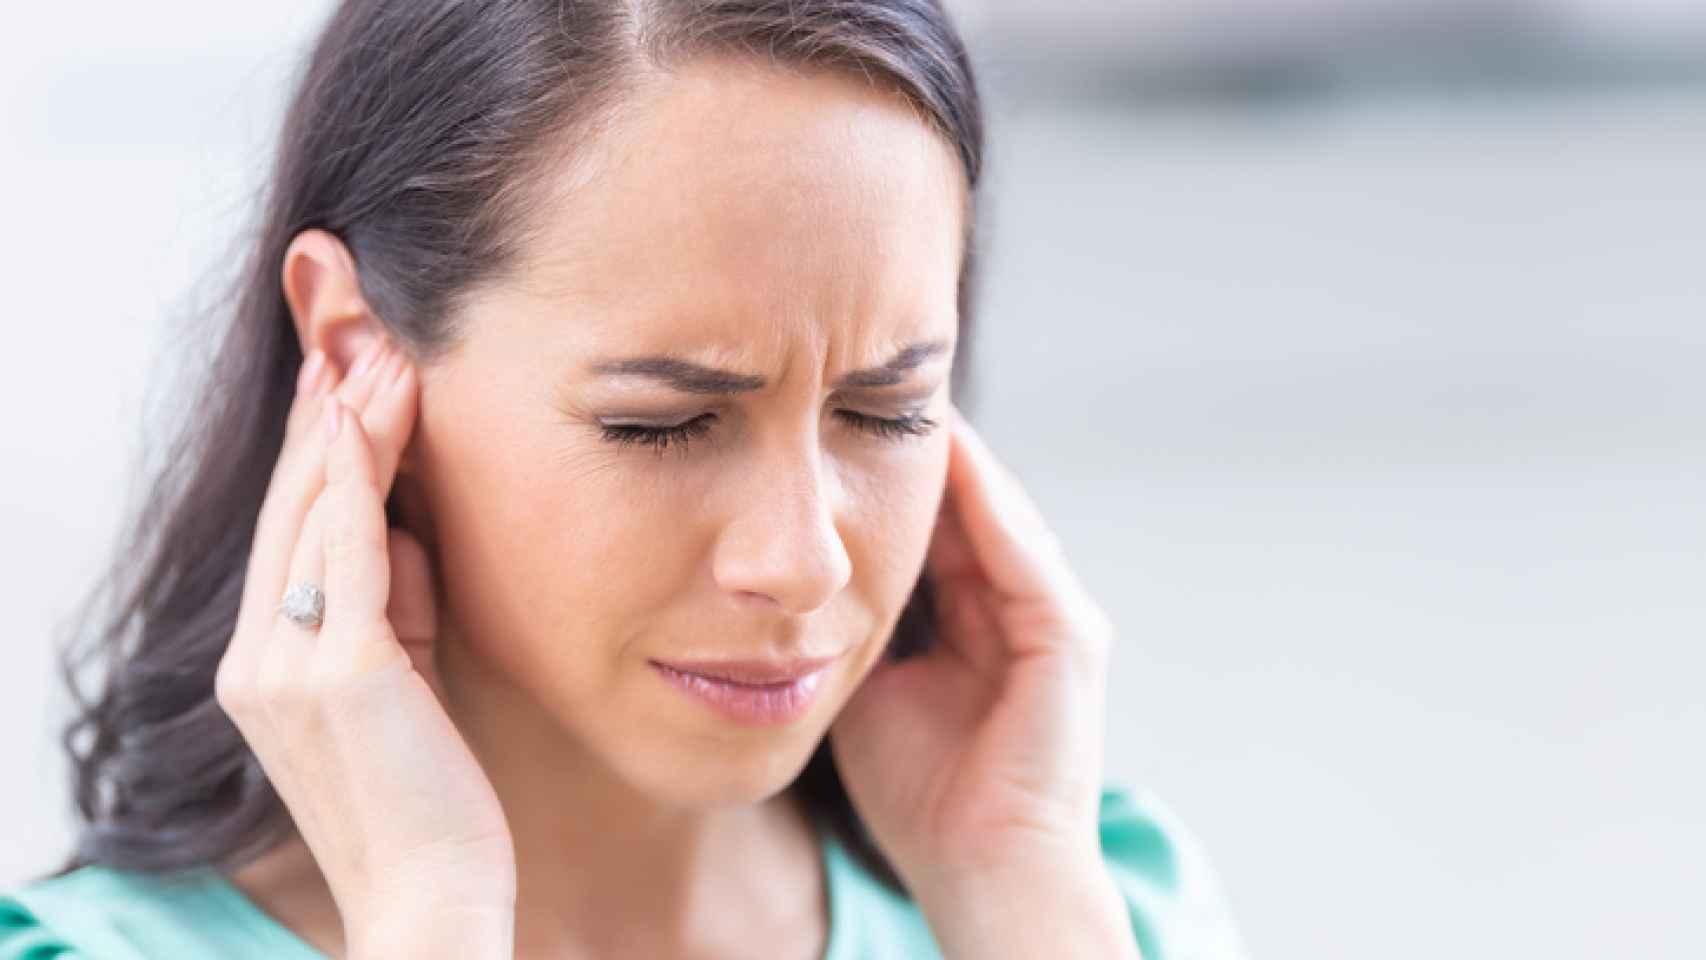 Cómo Destapar Un Oído 6 Trucos Para Terminar Con La Molestia